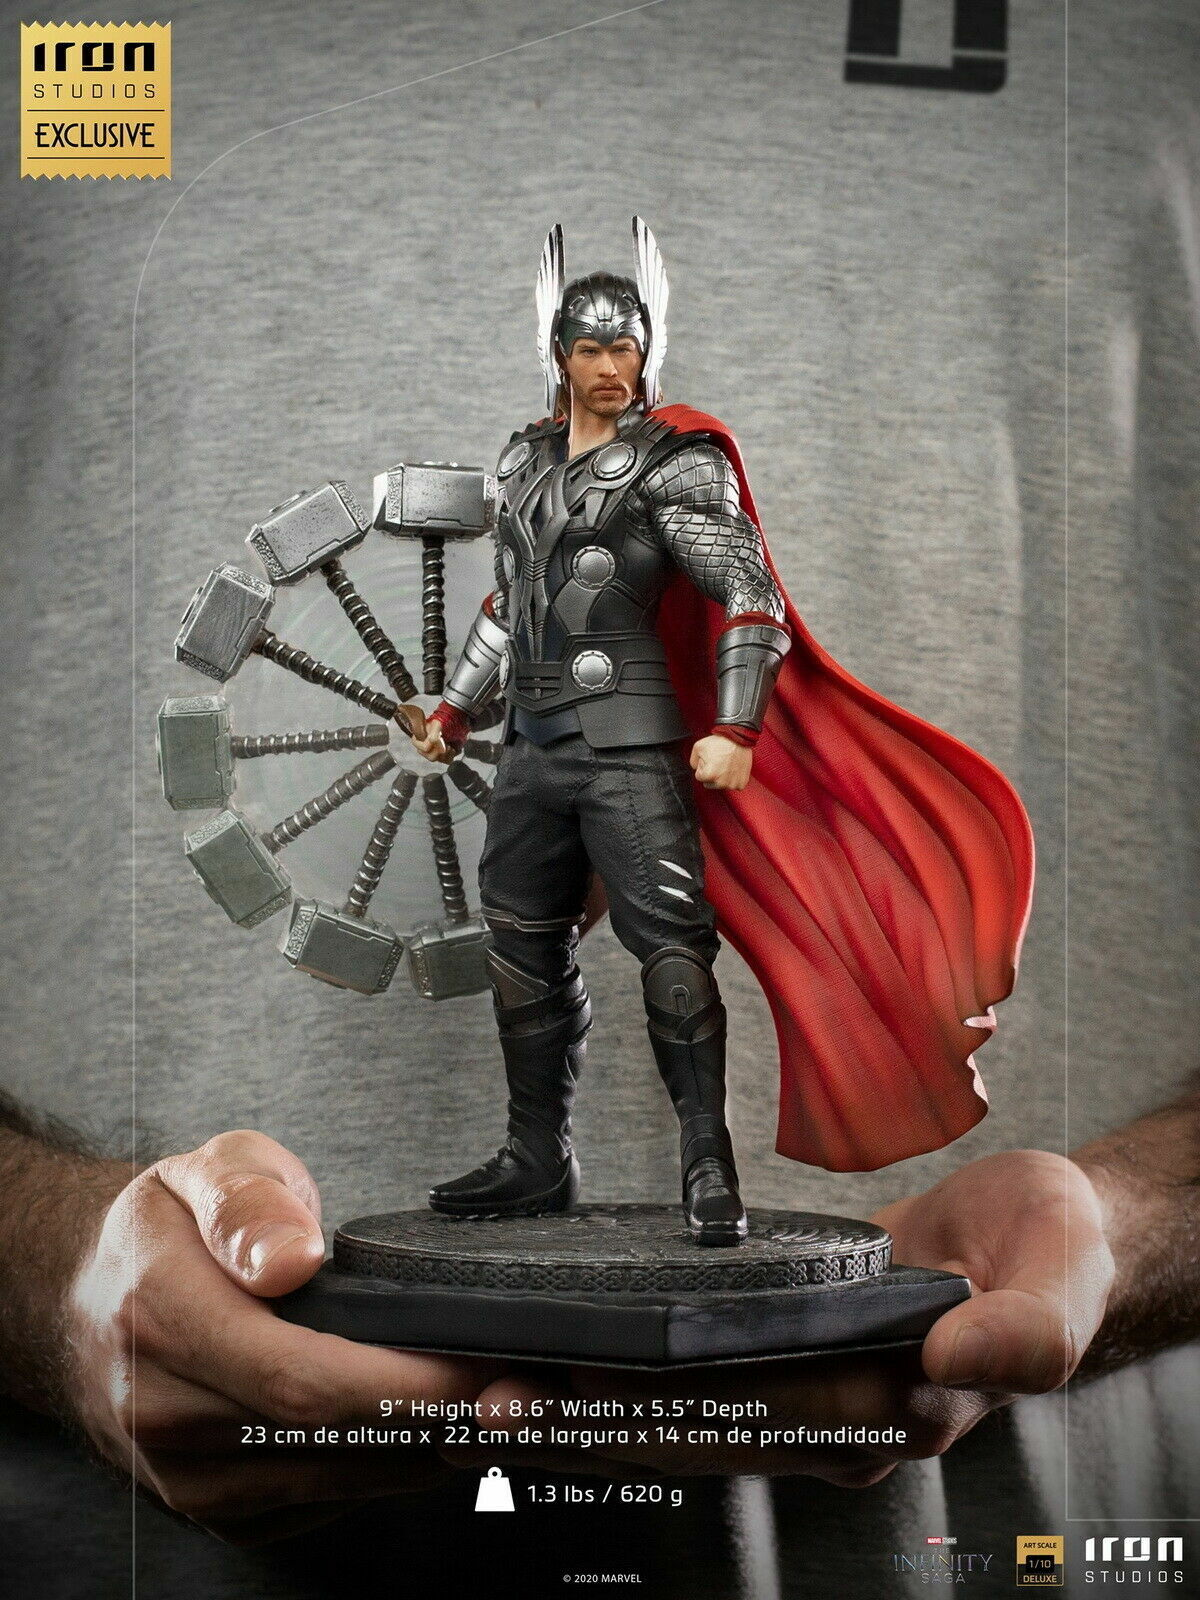 1/10 Iron Studios Thor Statue Mini Figure 9in. Avengers Static Figurine Model To on eBay thumbnail